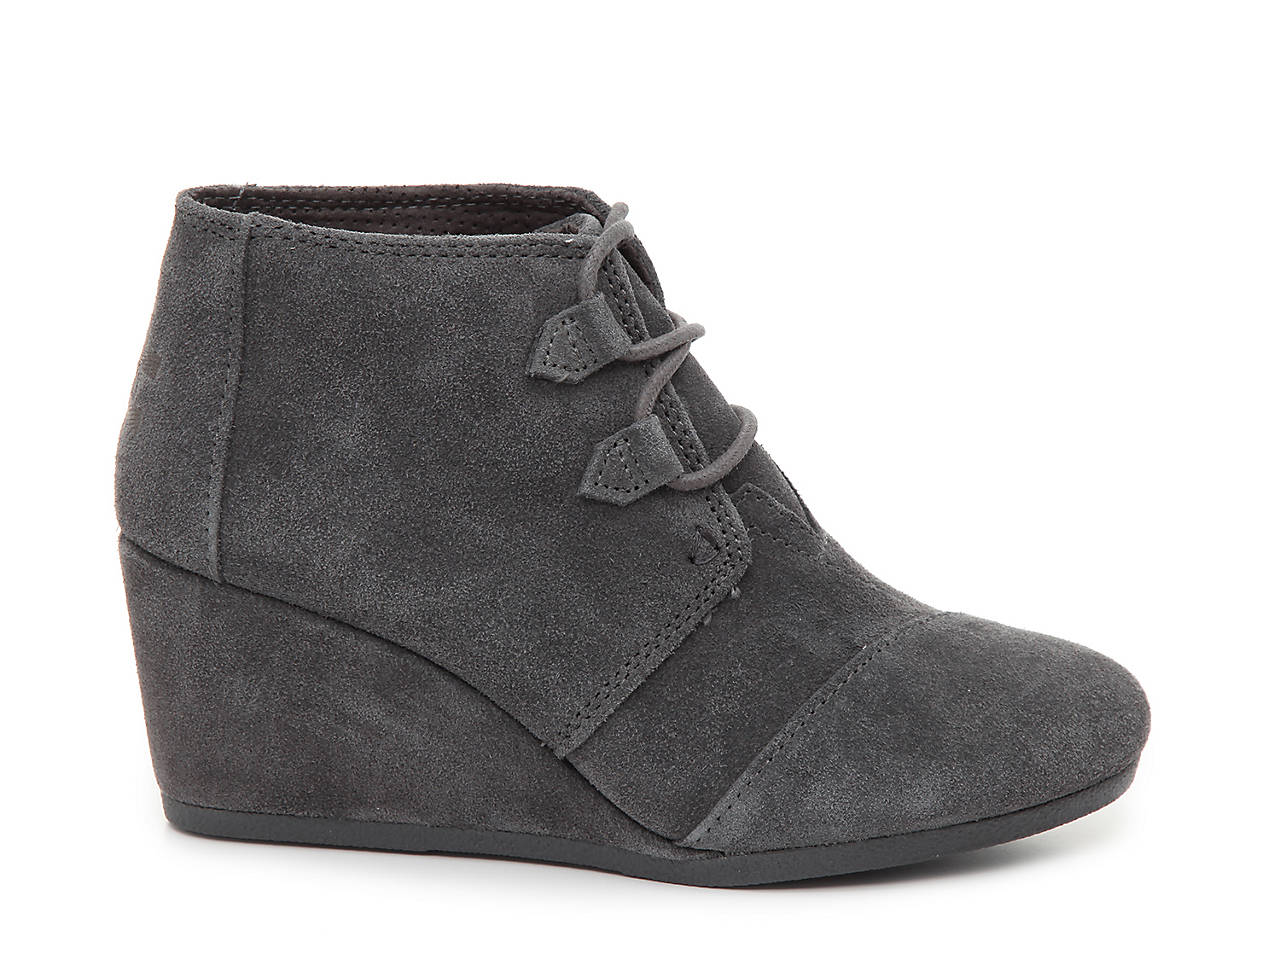 81f225732e6 TOMS Kala Wedge Bootie Women s Shoes